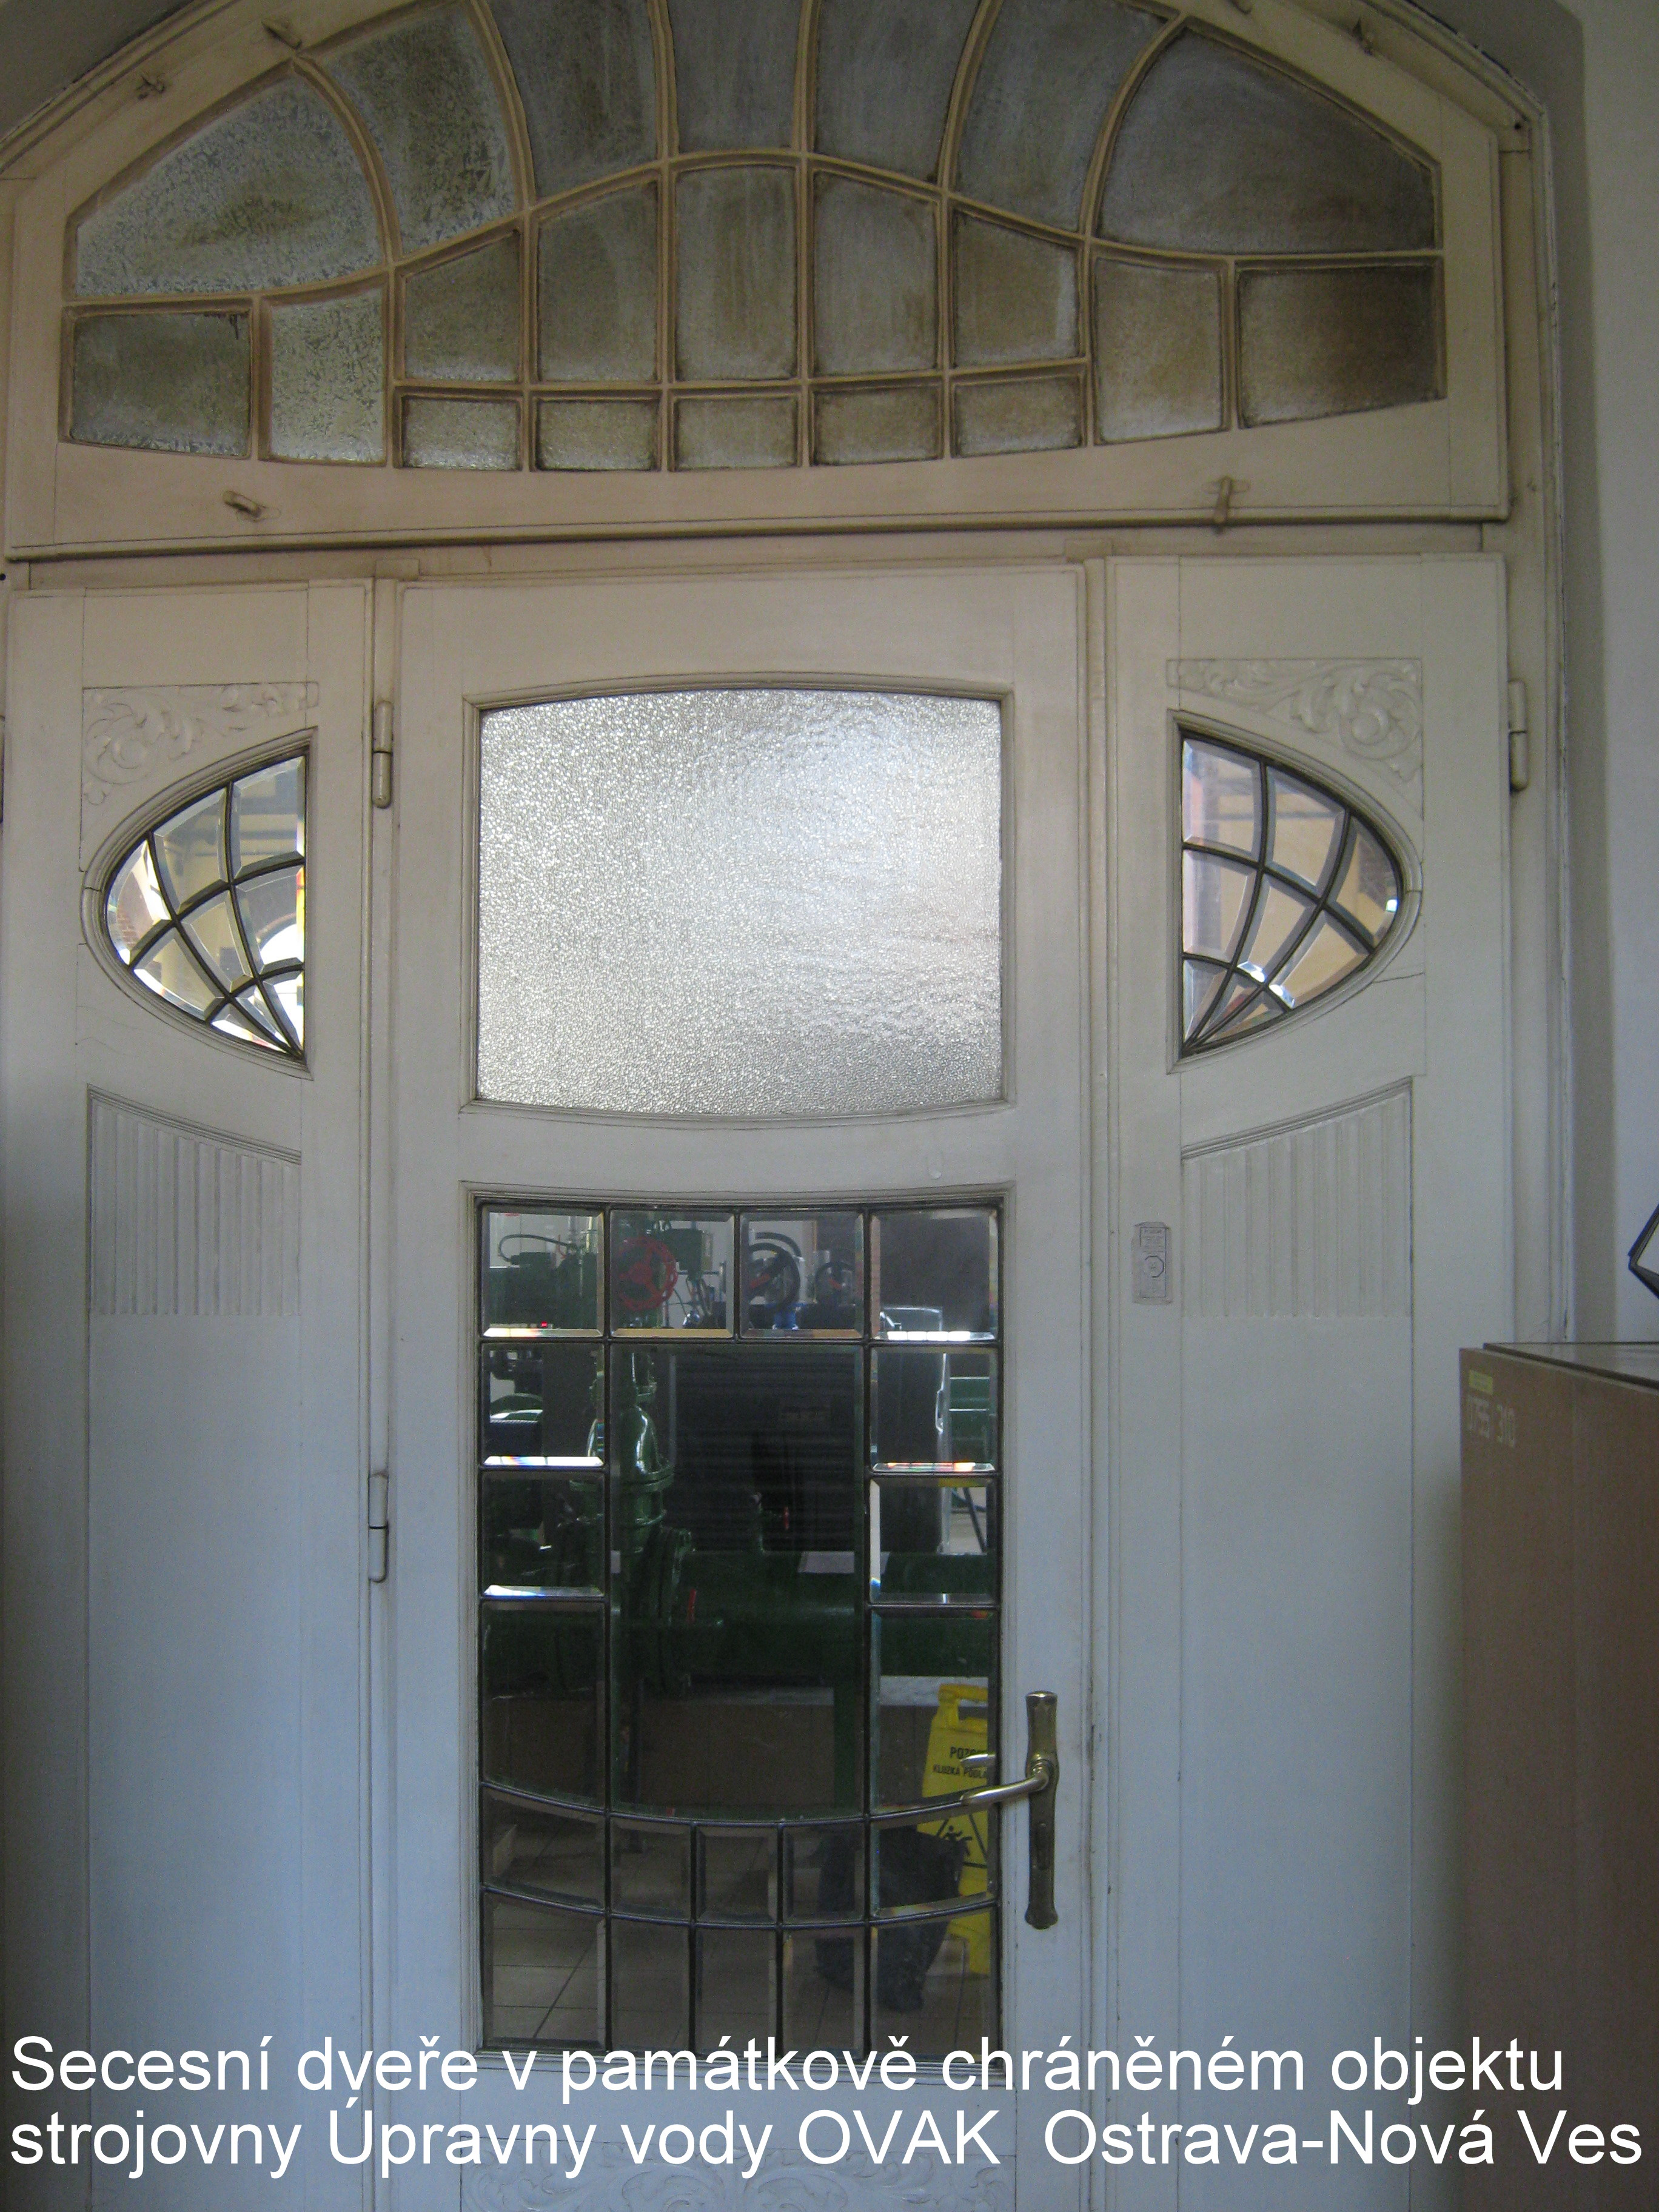 seces dvere 011